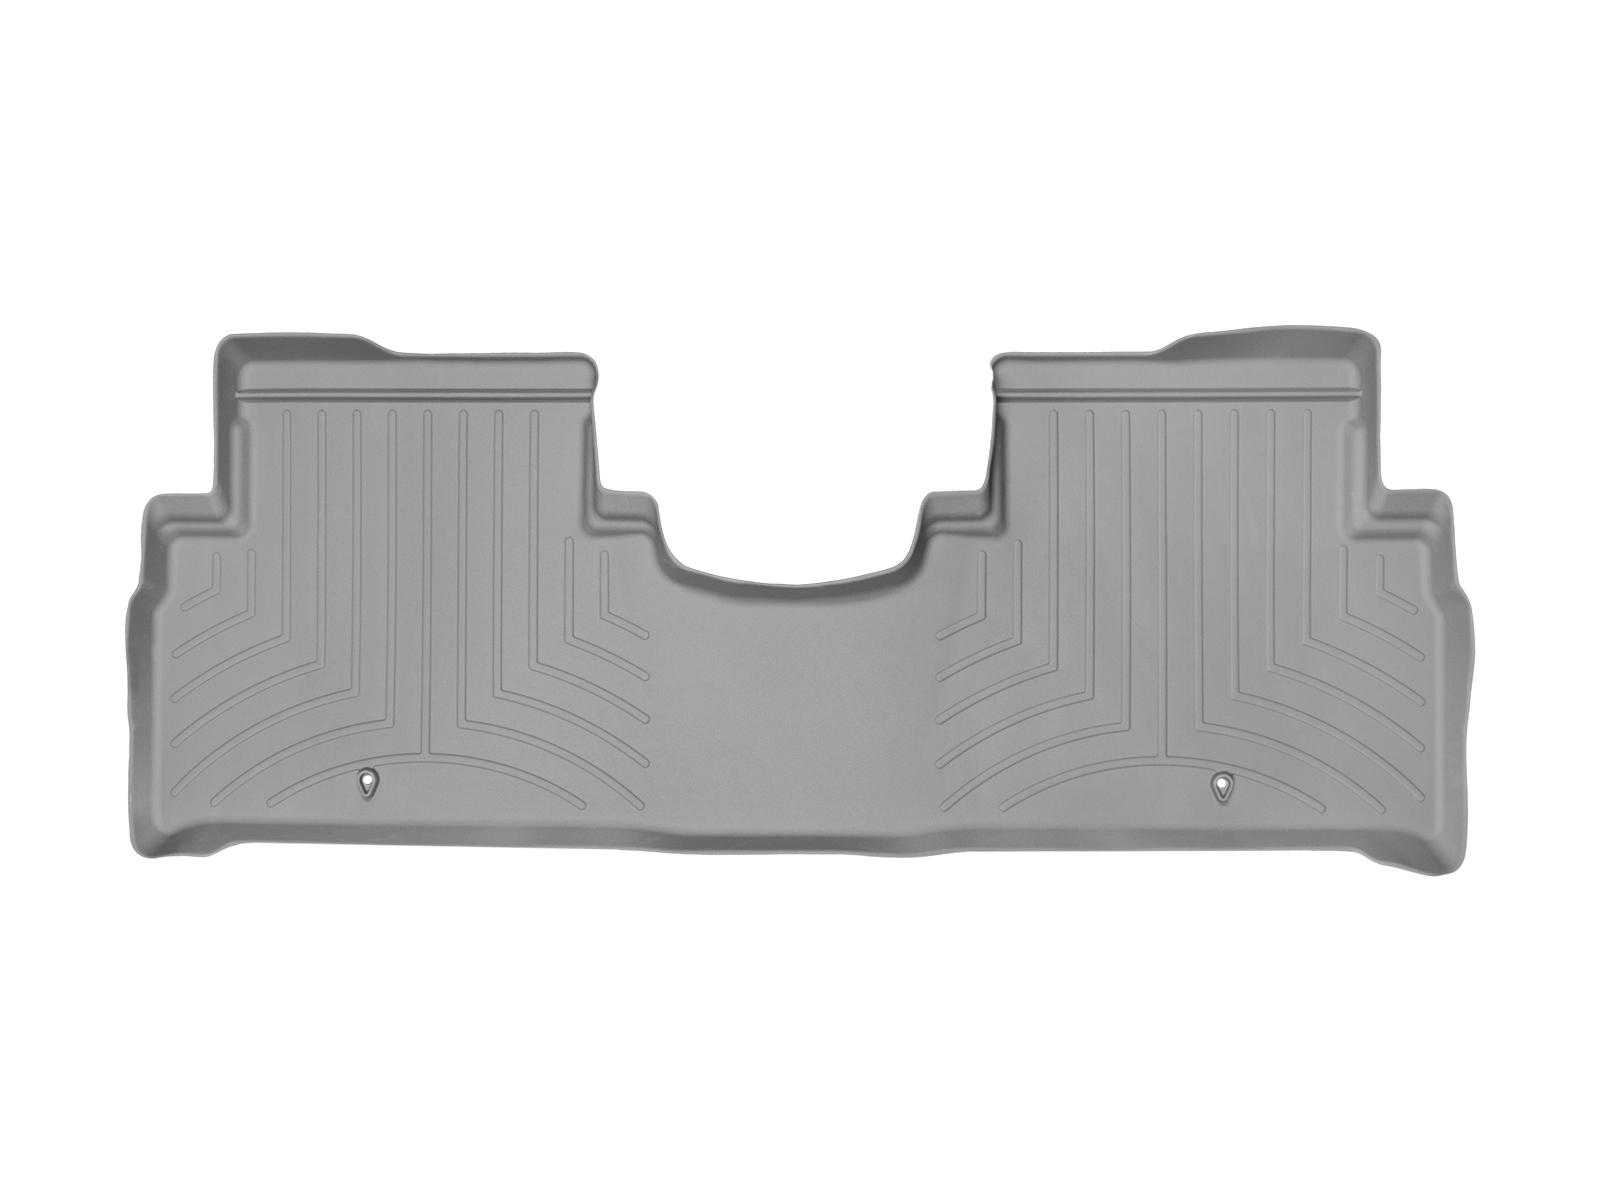 Tappeti gomma su misura bordo alto Kia Sorento 15>15 Grigio A1804*